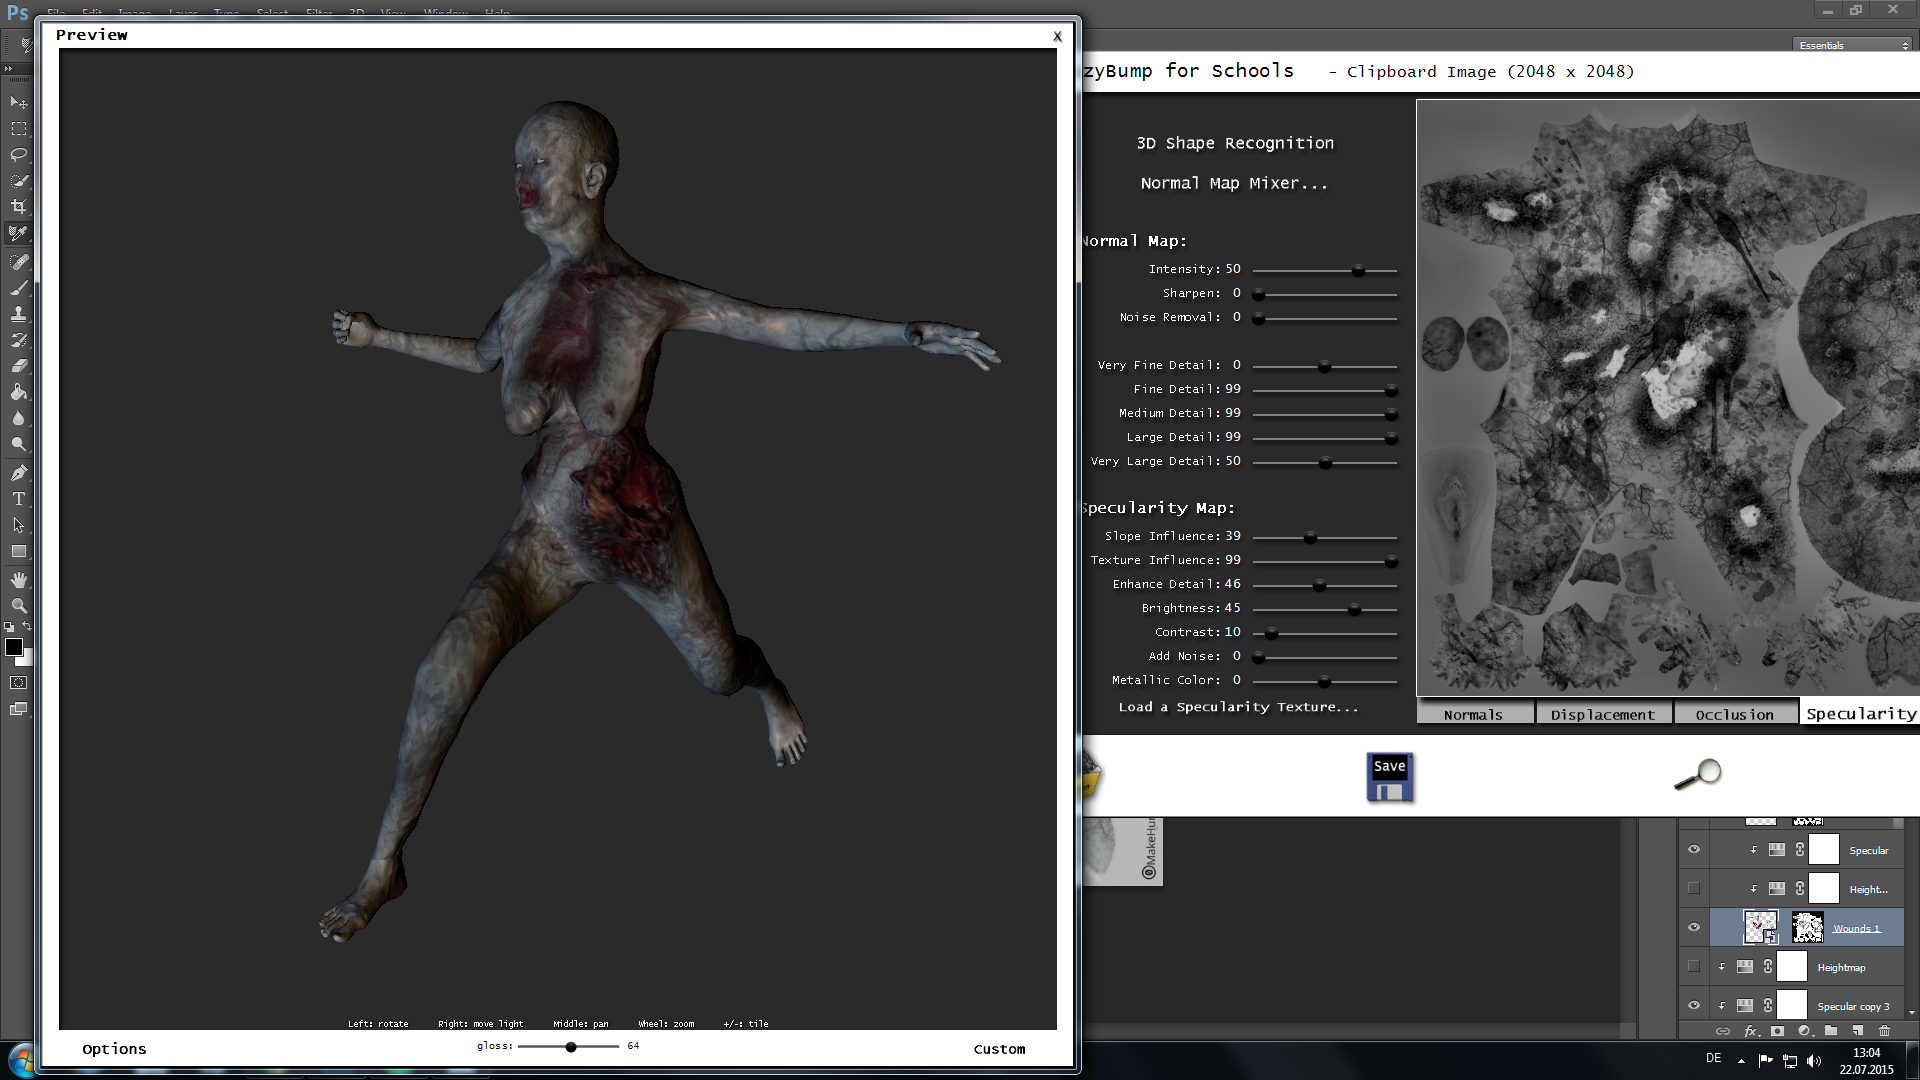 Zombiewoman